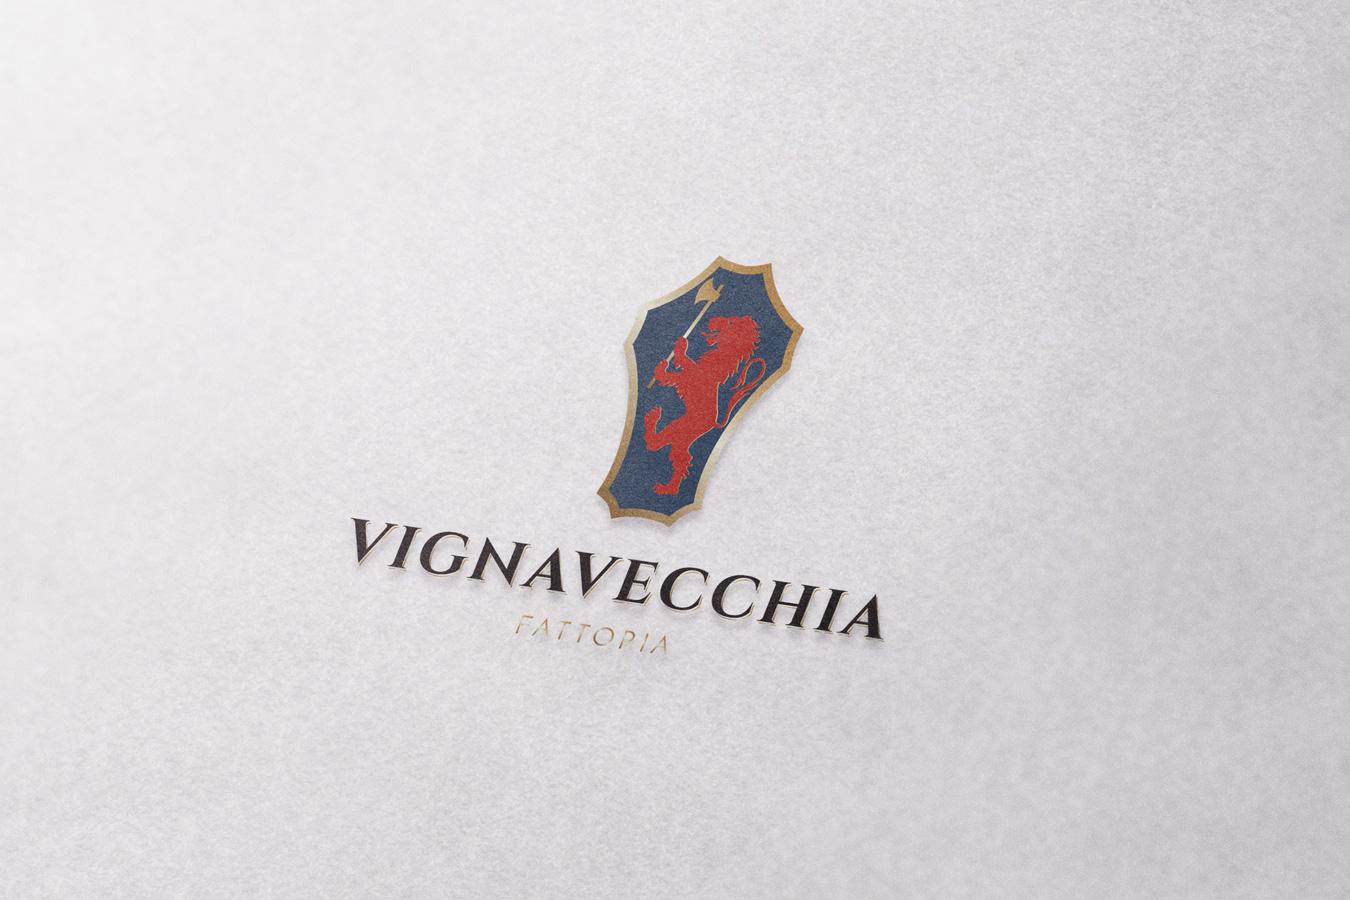 Vignavecchia logo 1